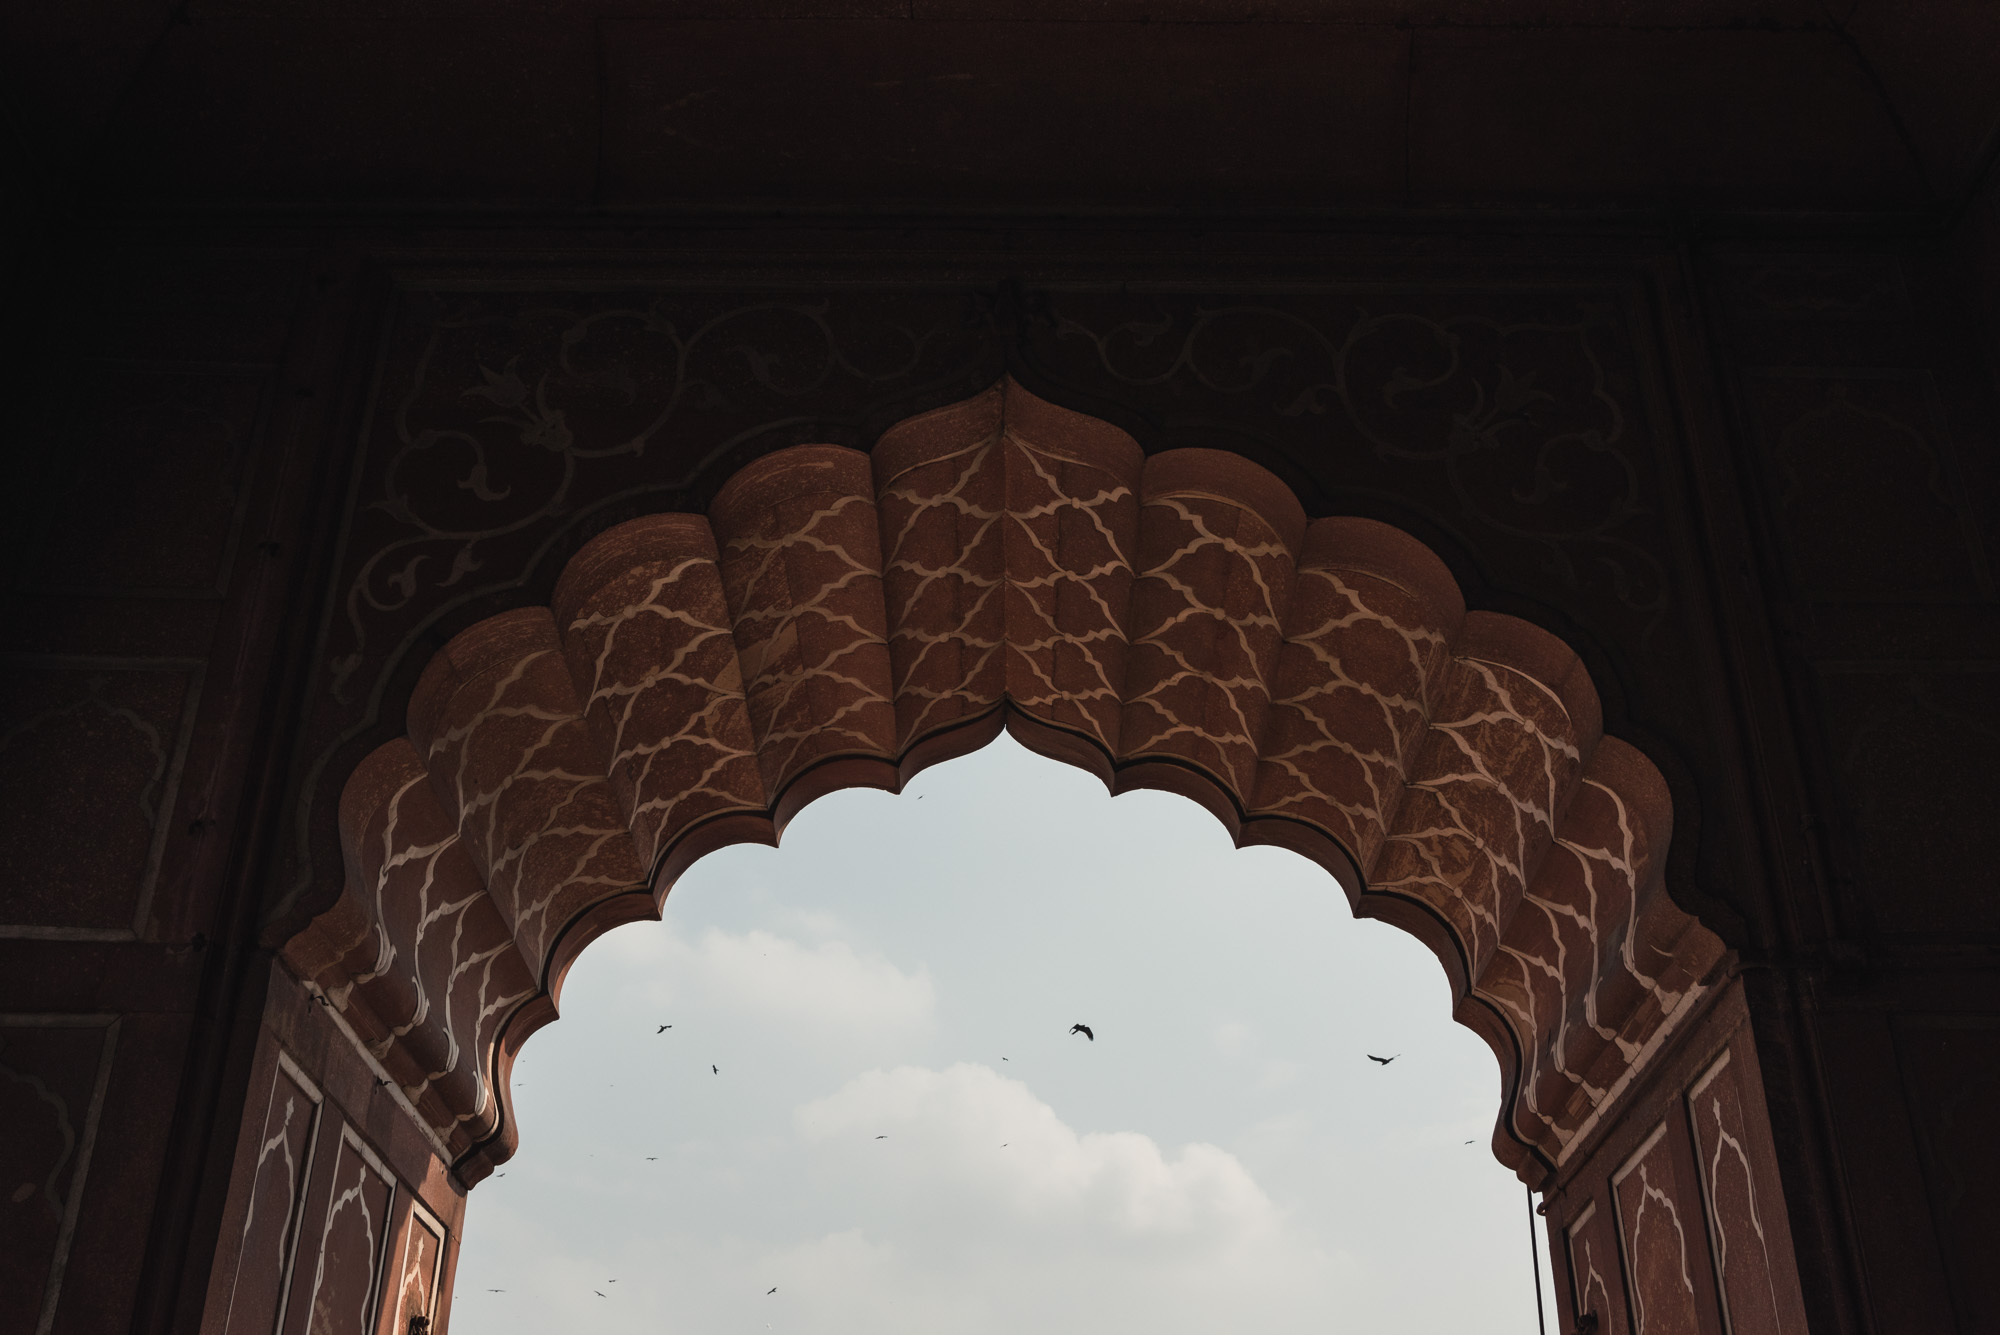 Arch at Jama Masjid Old Delhi